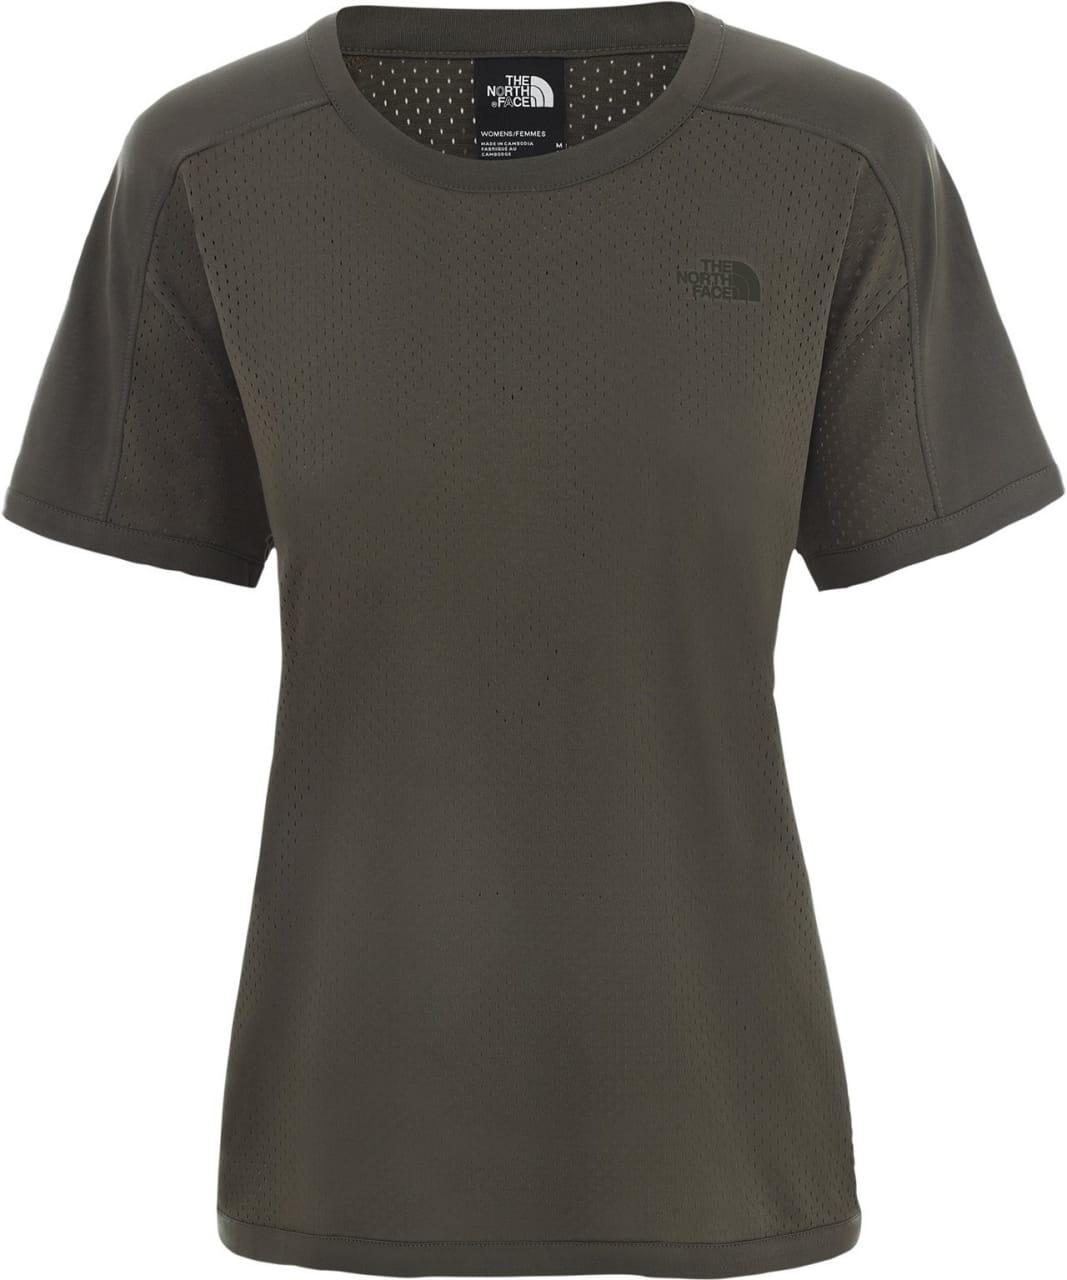 T-Shirts The North Face Women's Train N Logo T-Shirt